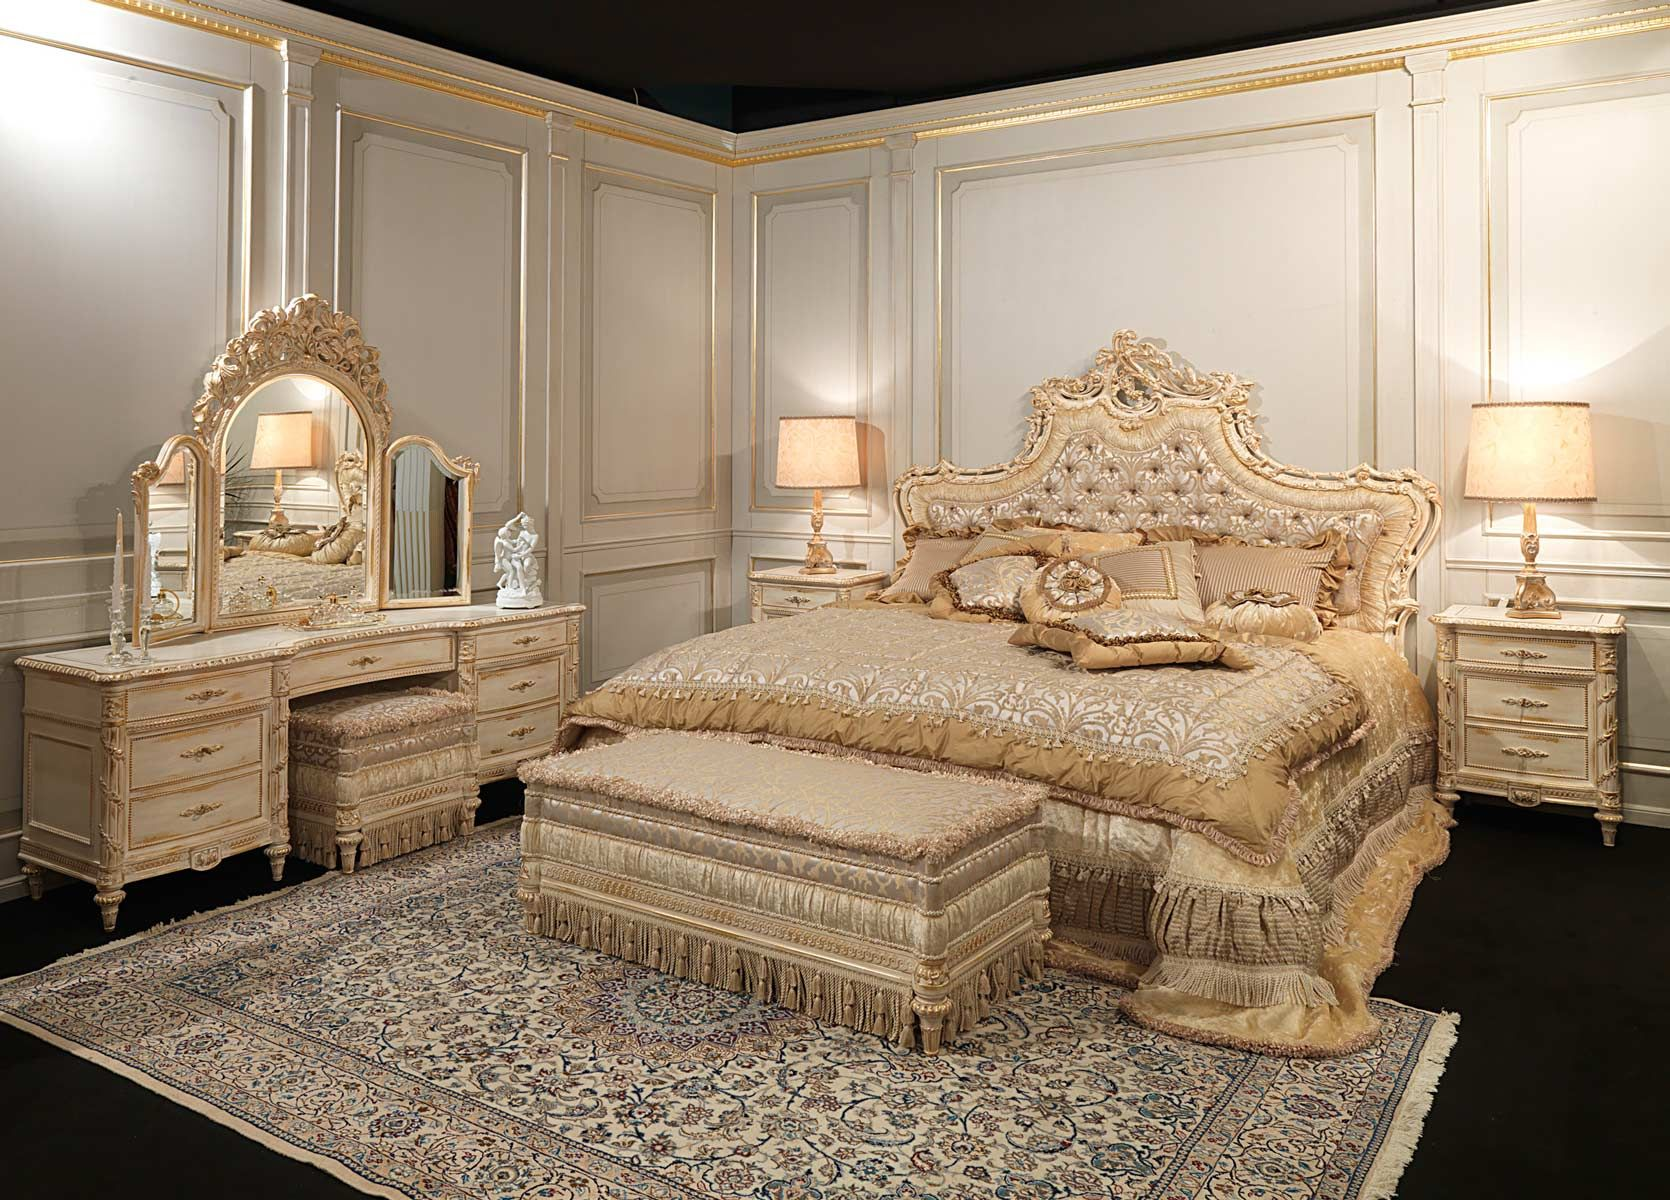 Bedroom The Fantastic Queen Size Bedroom Furniture Design Along